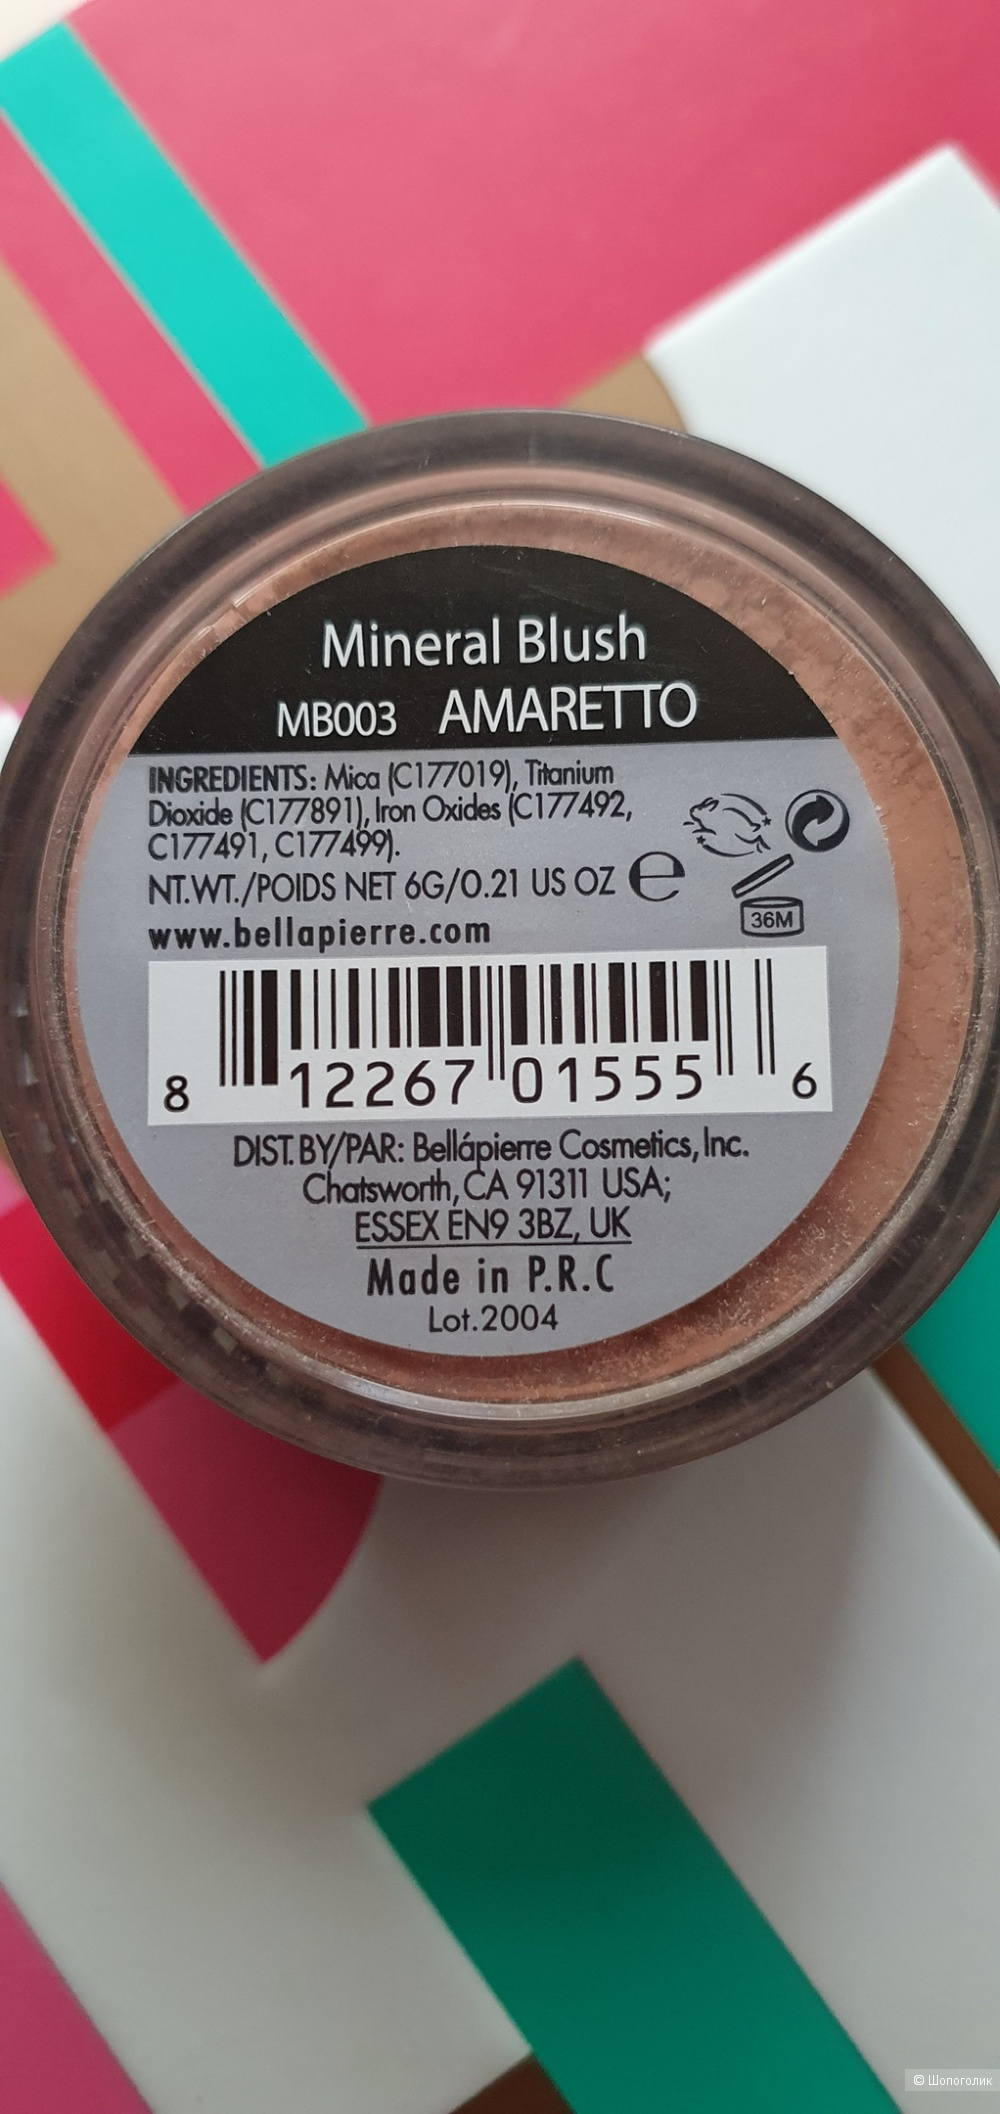 Bellapierre рассыпчатые минеральные румяна (Amaretto)